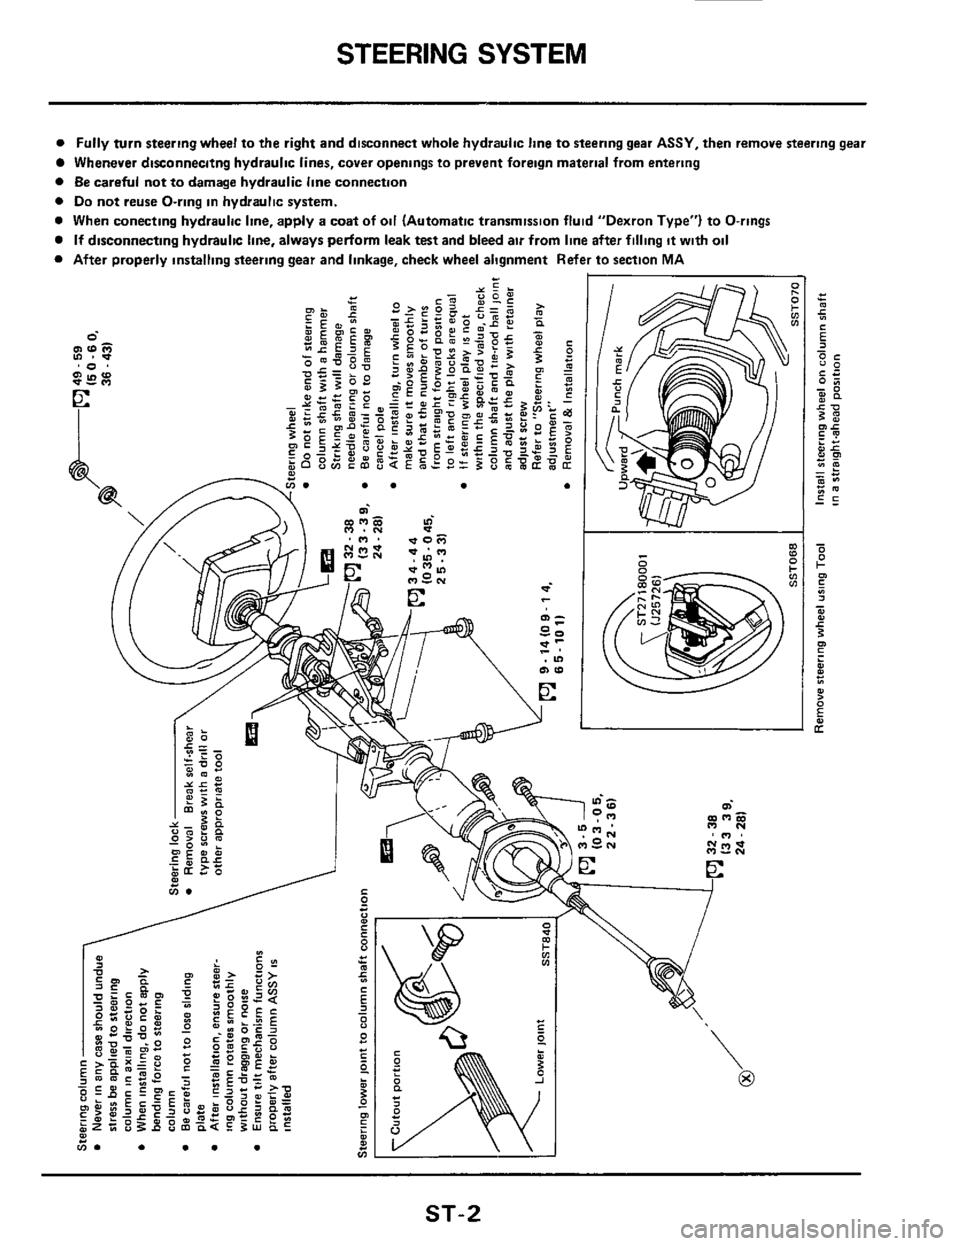 medium resolution of 63 willys jeep wiring diagram jeep auto wiring diagram 1951 willys pickup wiring diagram 1955 willys pickup wiring diagram